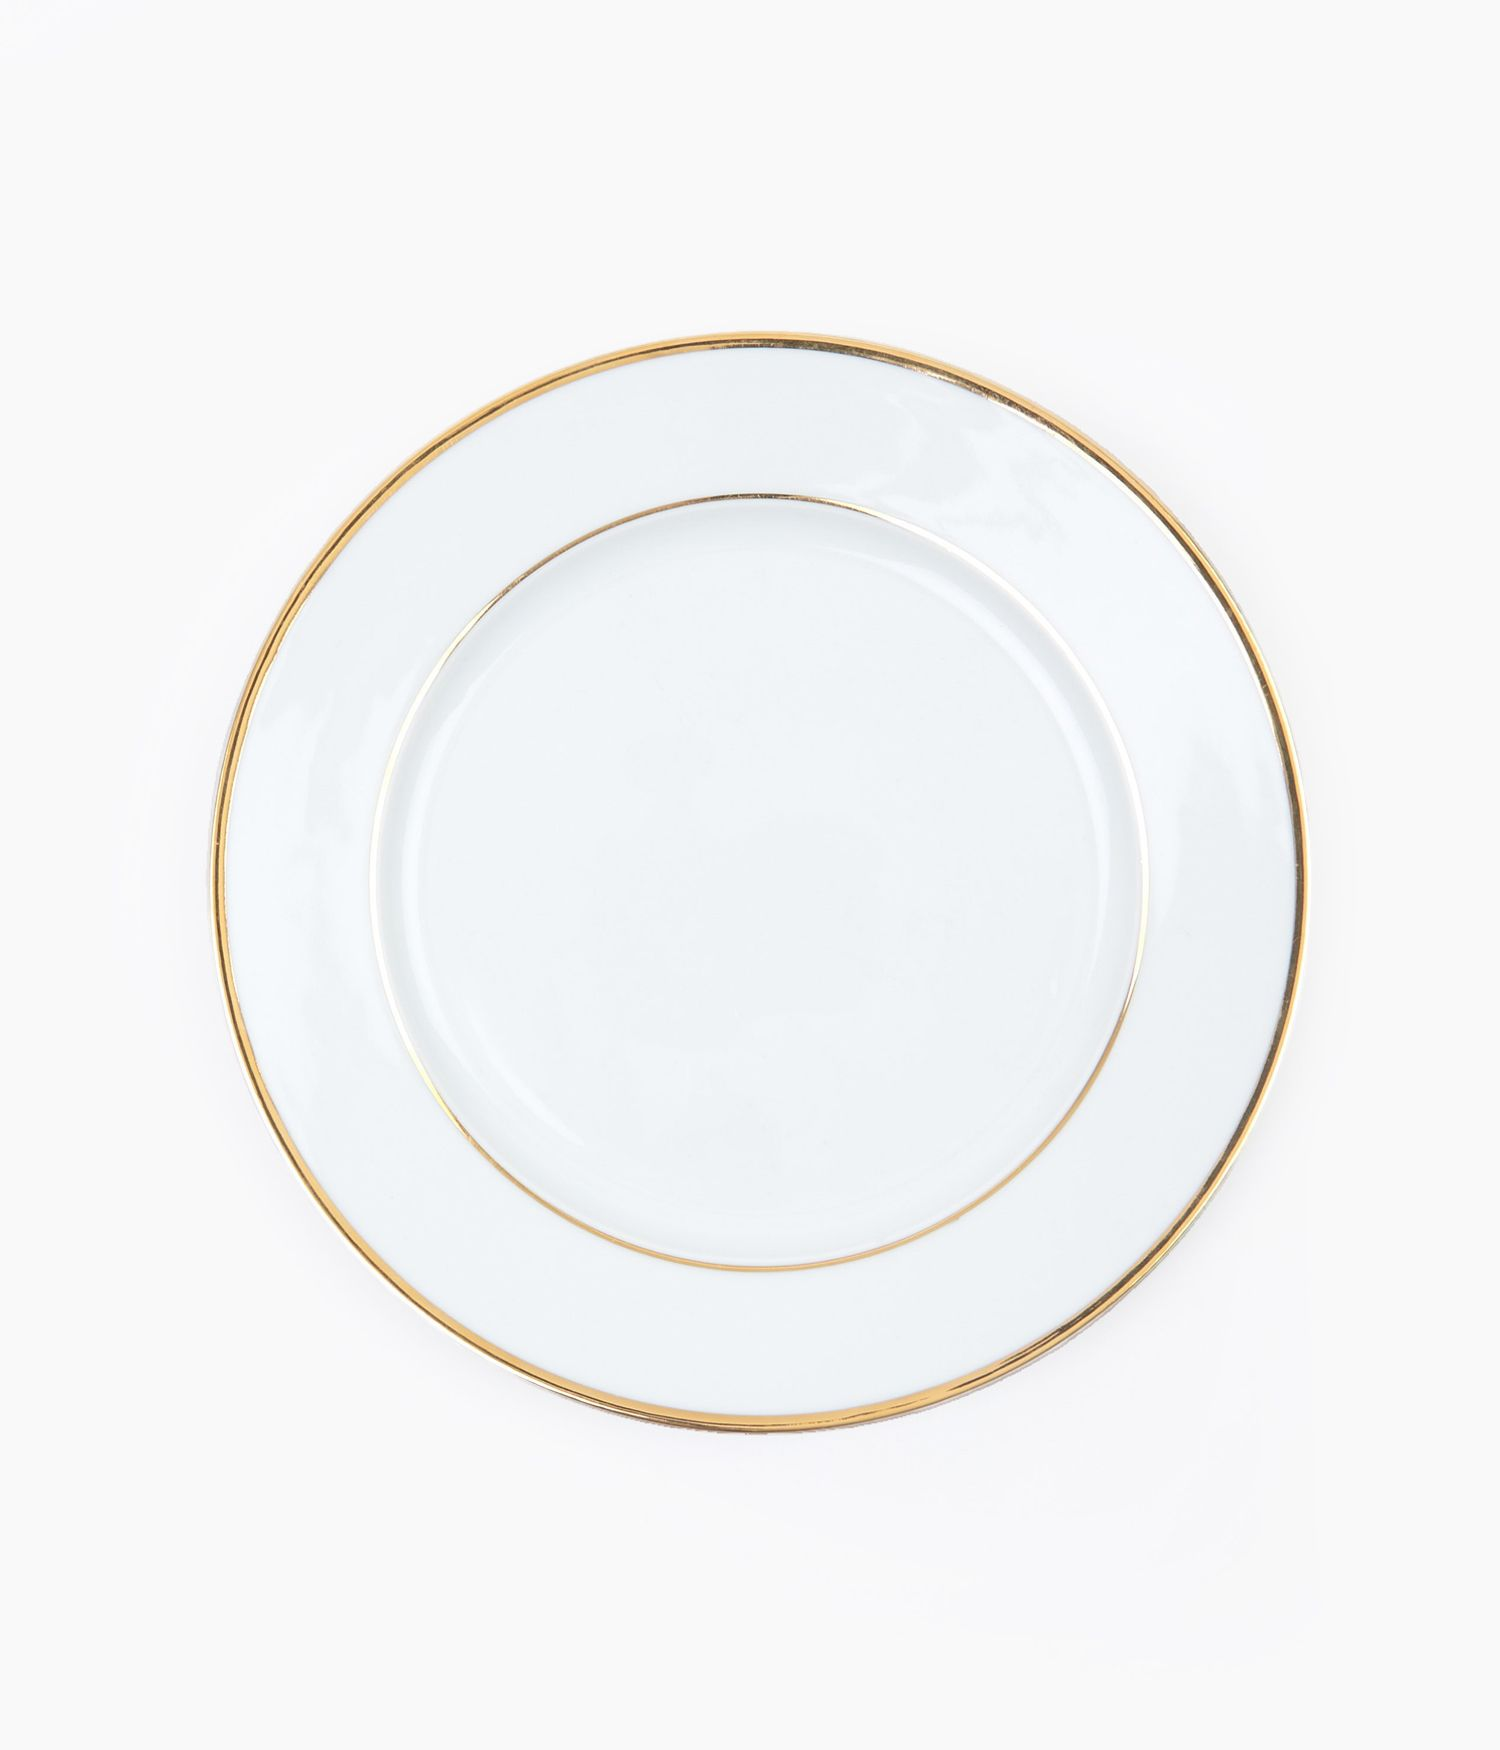 assiette plate ginger blc